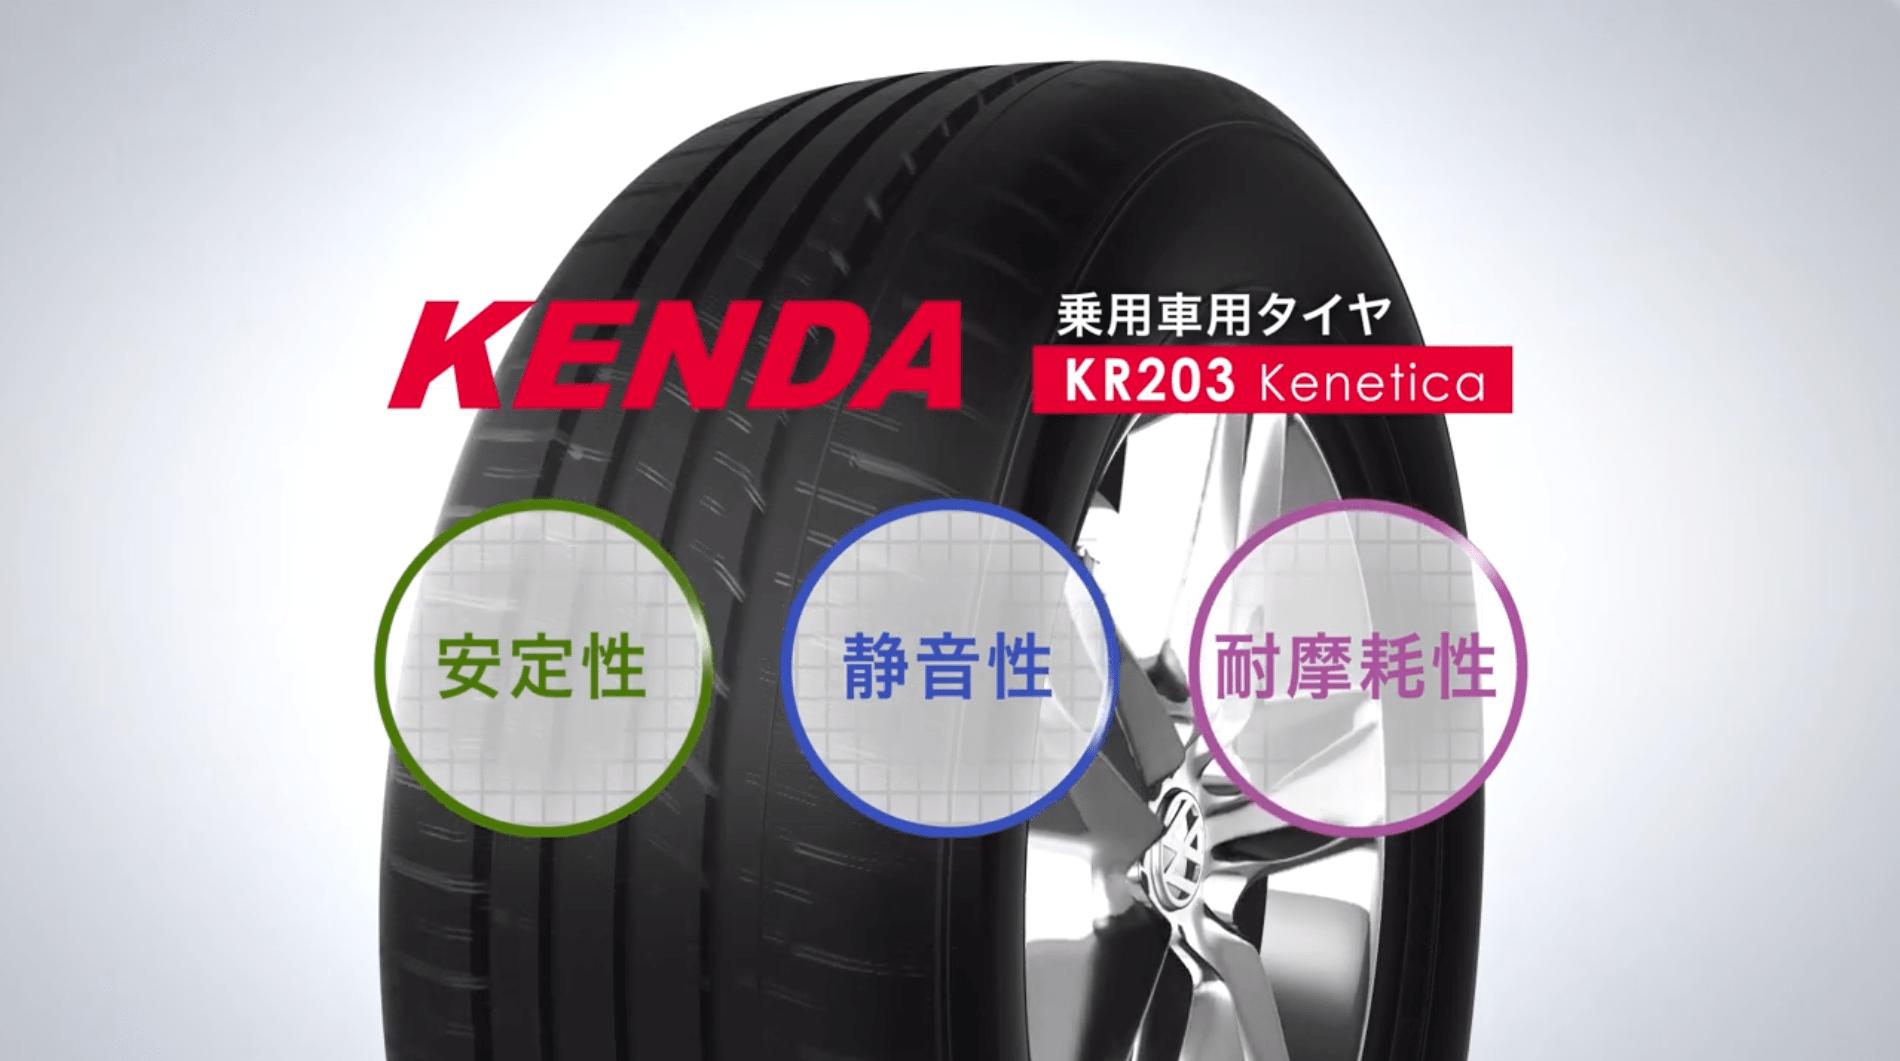 KENDA 乗用車用タイヤ KR203 Kenetica のご紹介